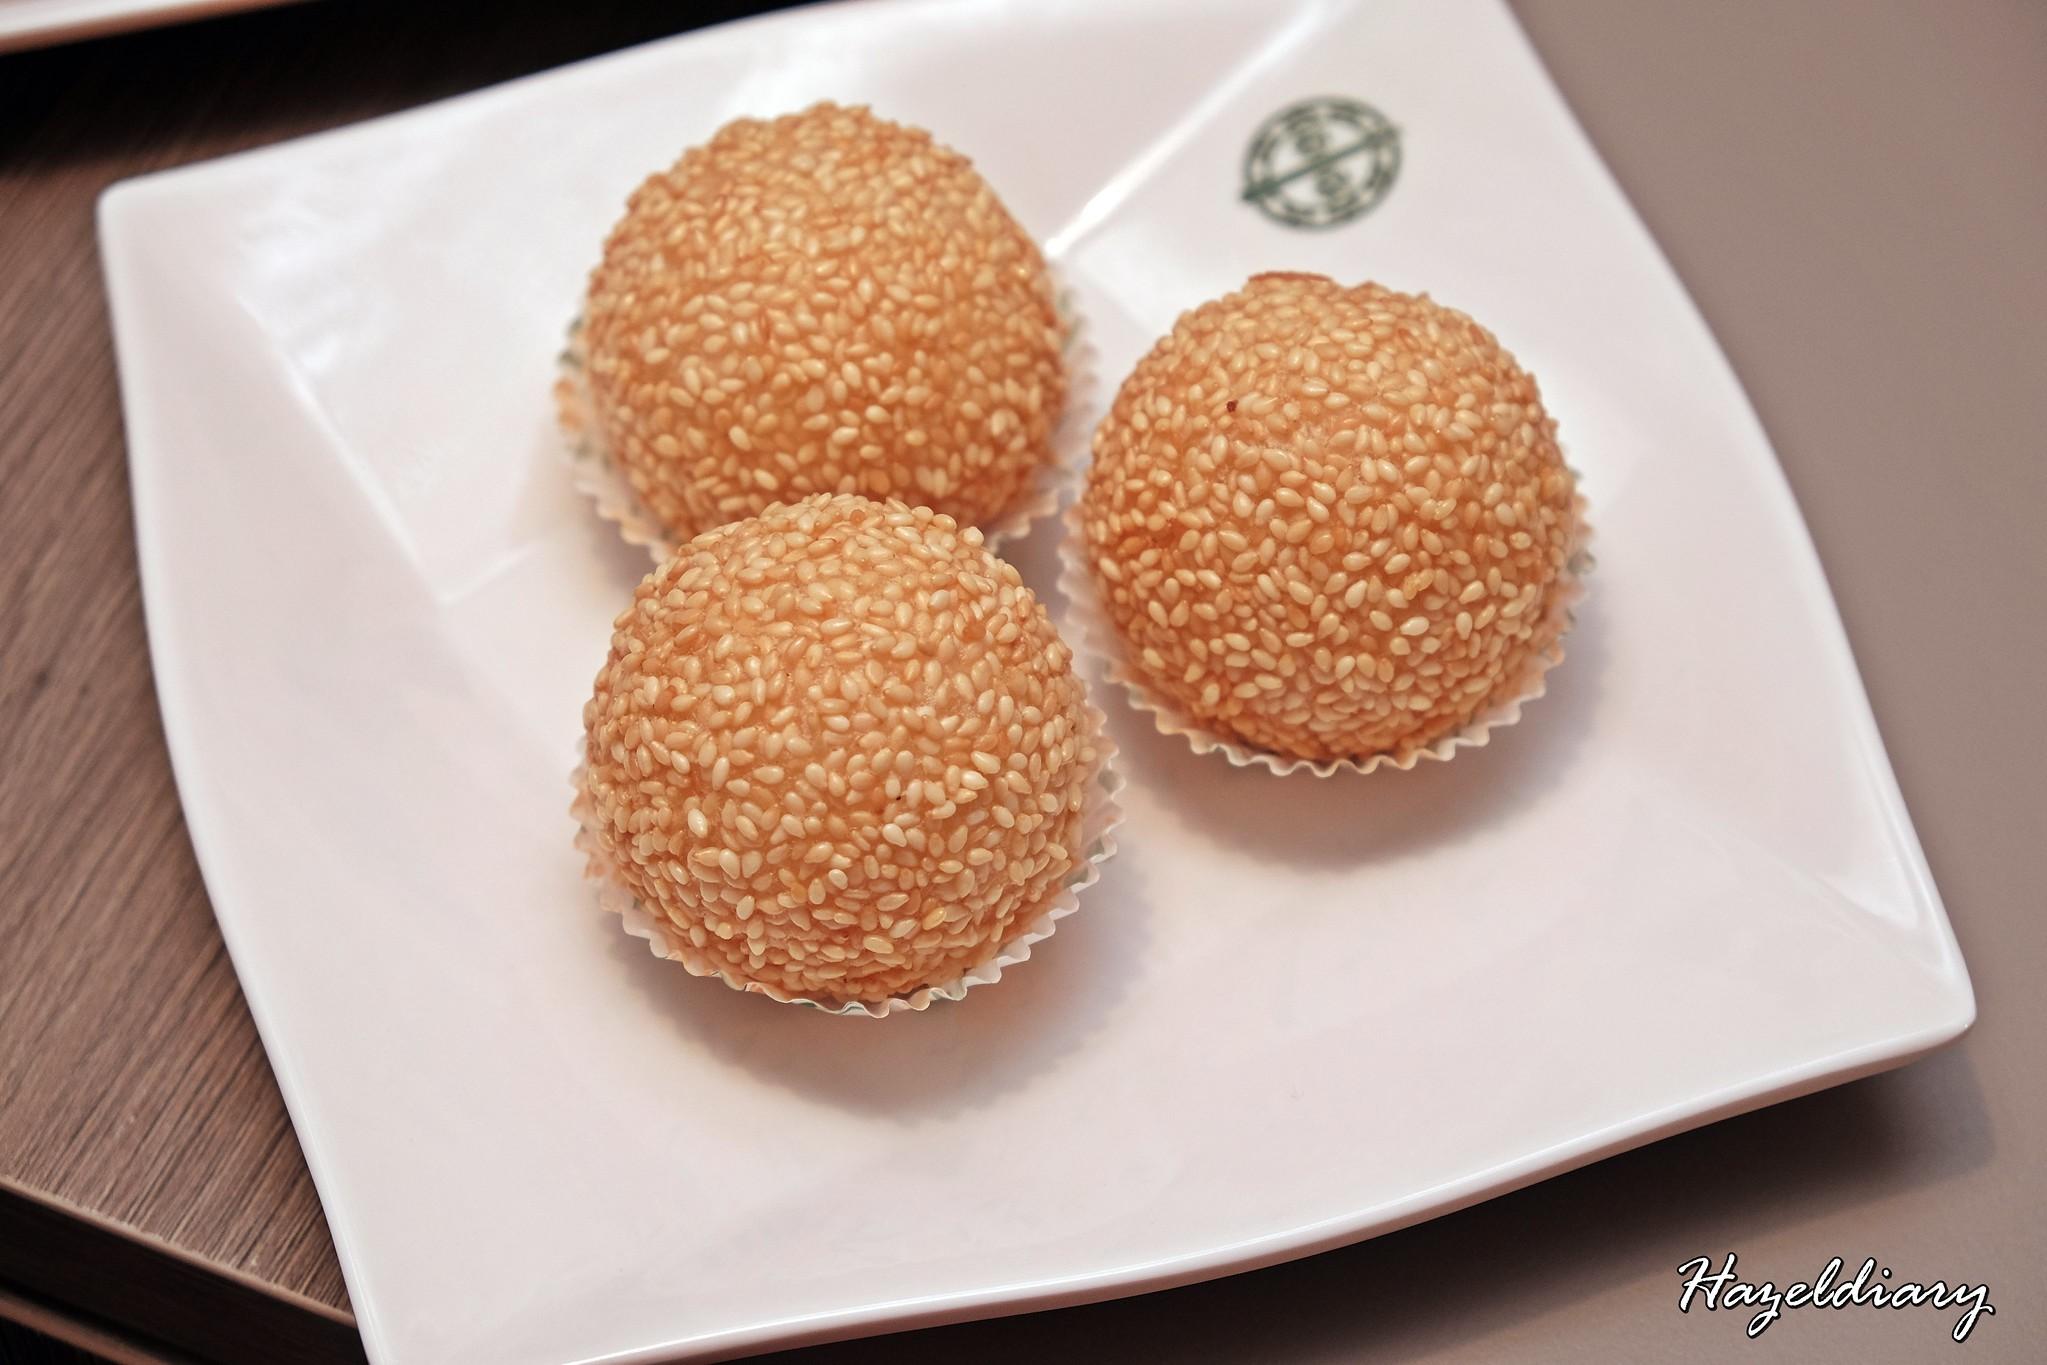 Tim Ho Wan -Sesame Ball